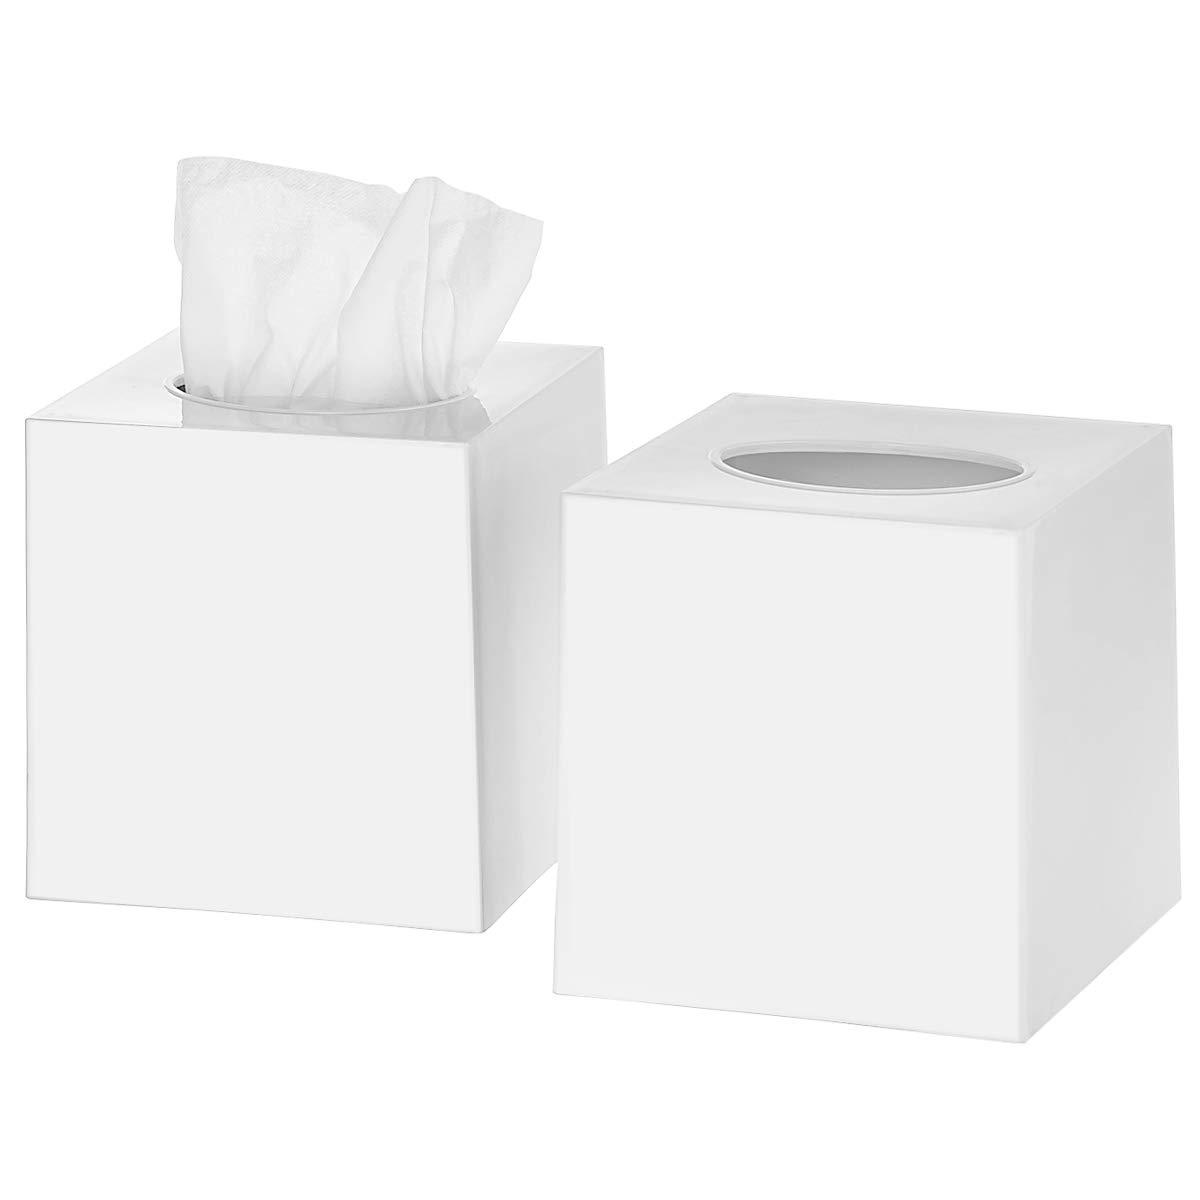 DWËLLZA HOMË Tissue Box Cover Square - Facial Cube Tissue Box Holder Case Dispenser for Bathroom Vanity Countertop, Bedroom Dresser, Office Desk or Night Stand Table, 2 Pack - White by DWËLLZA HOMË